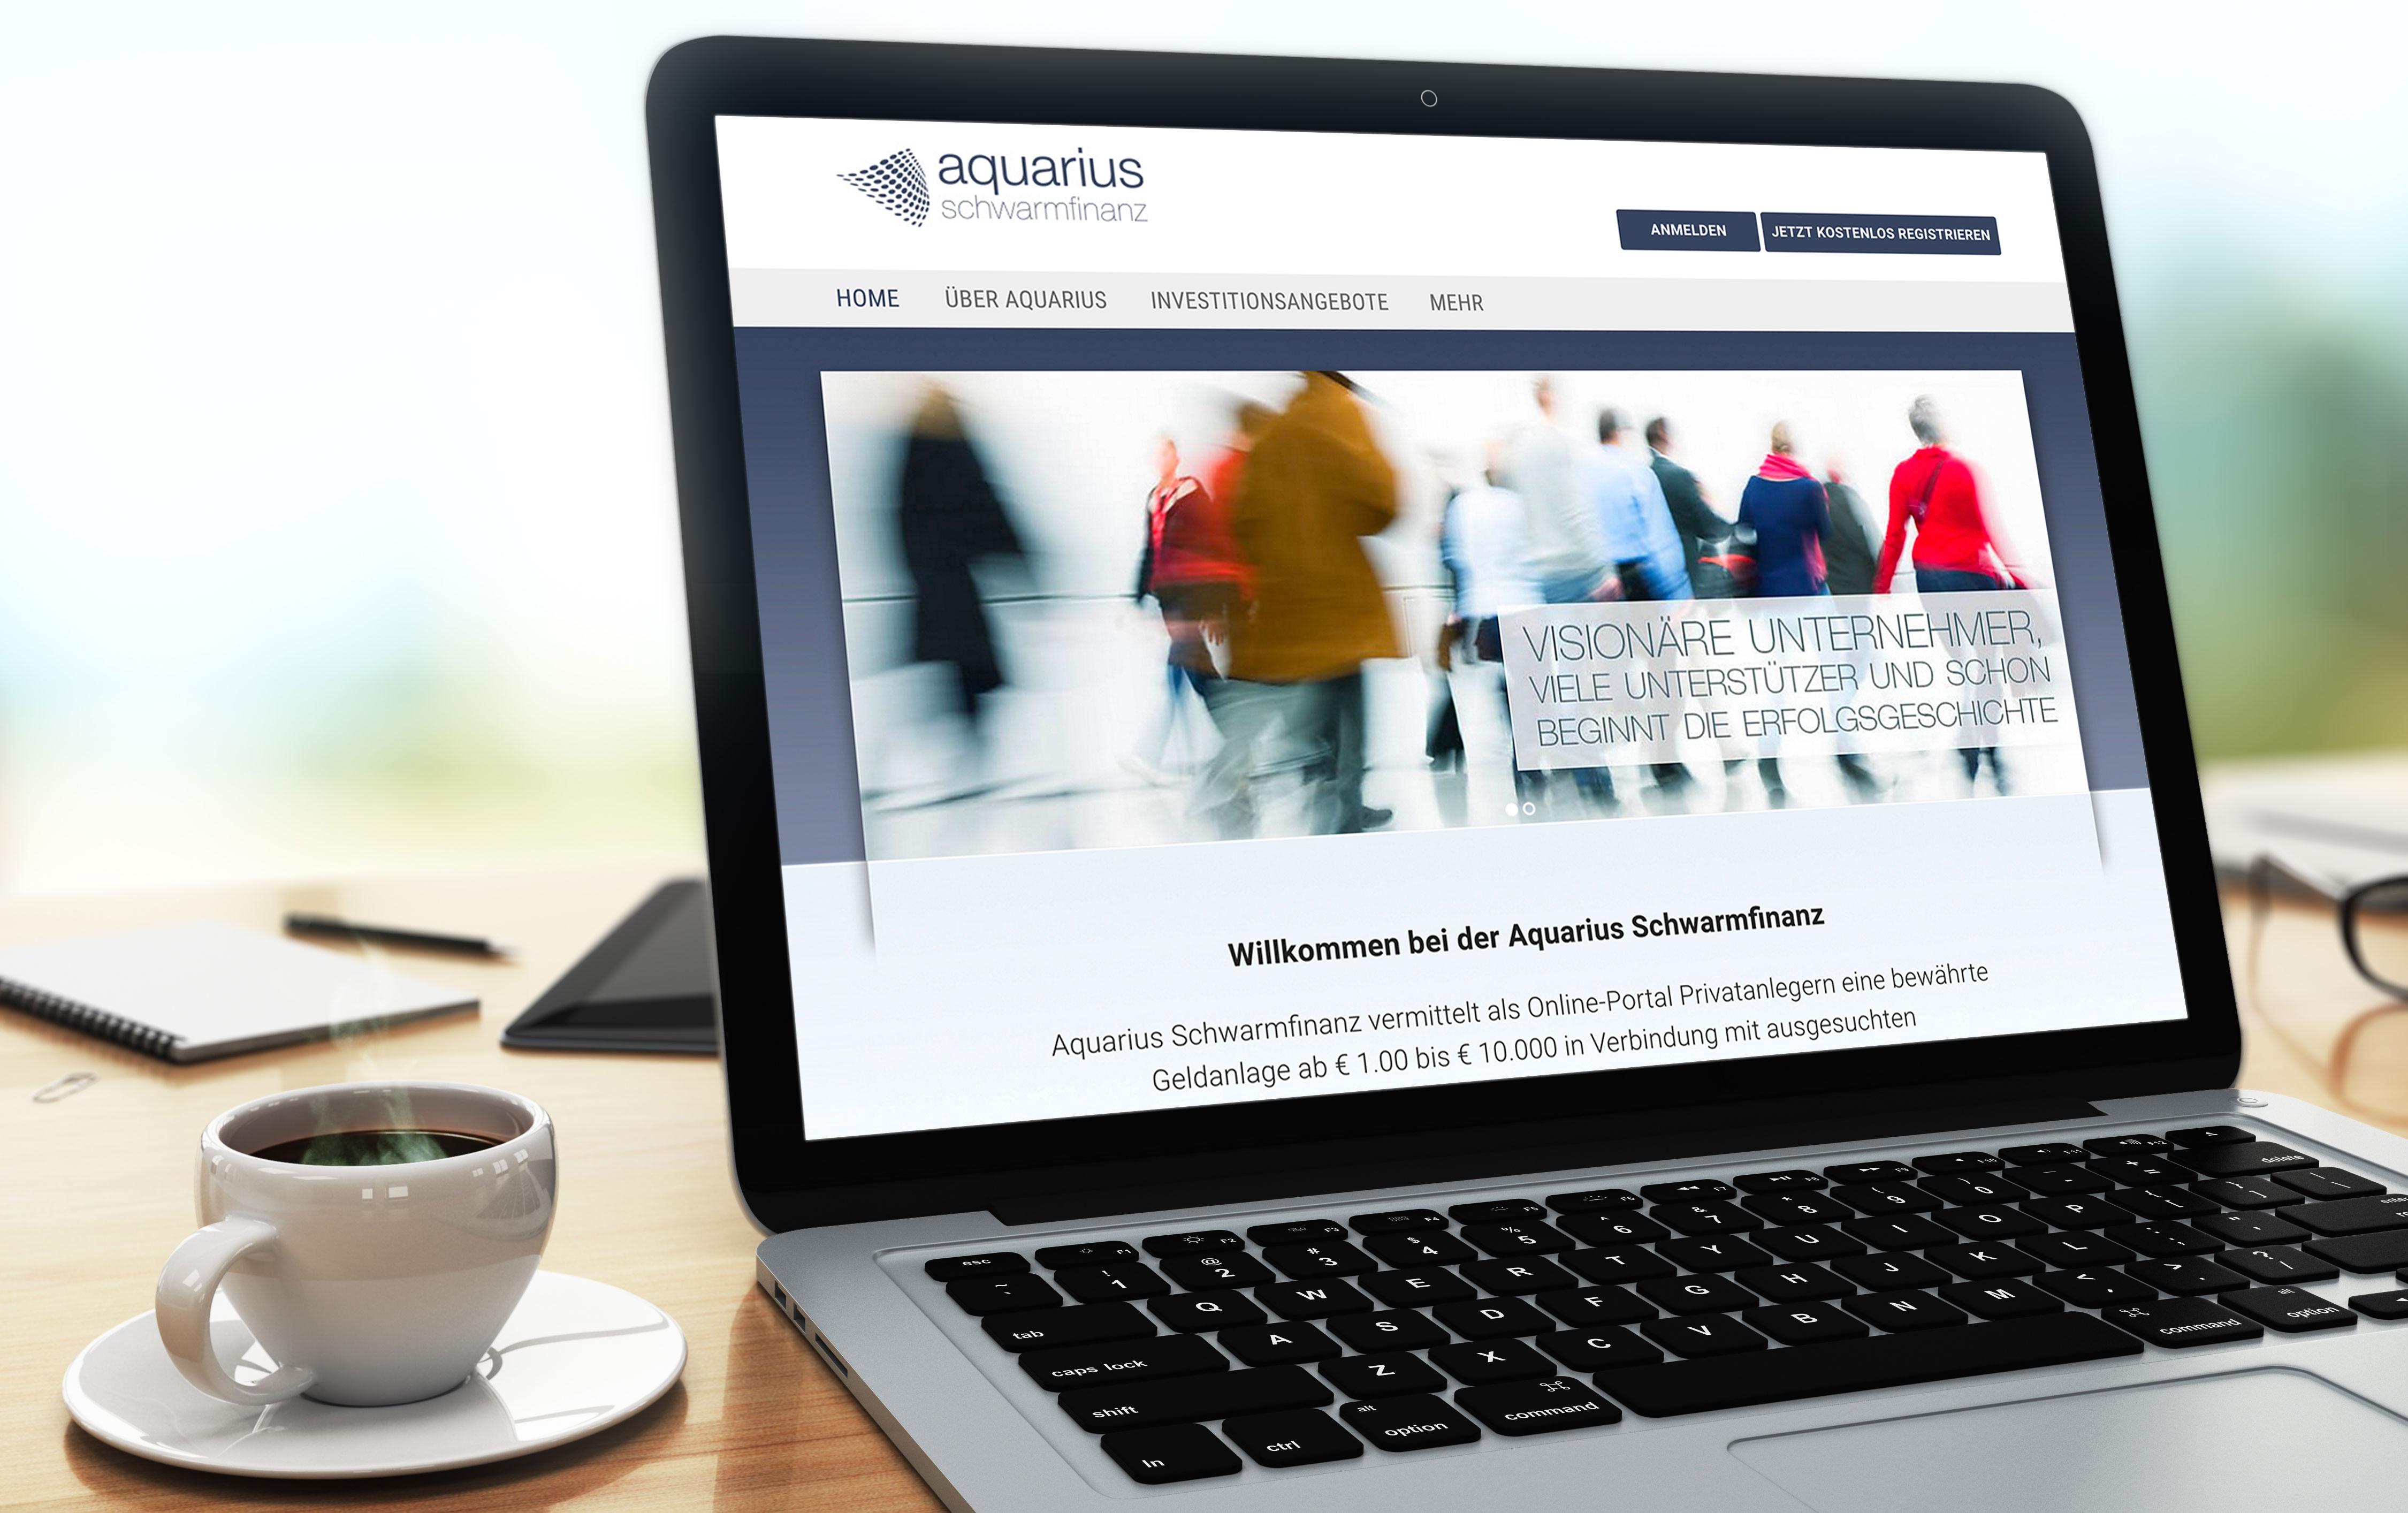 aquarius_schwarmfinanz_website_screen